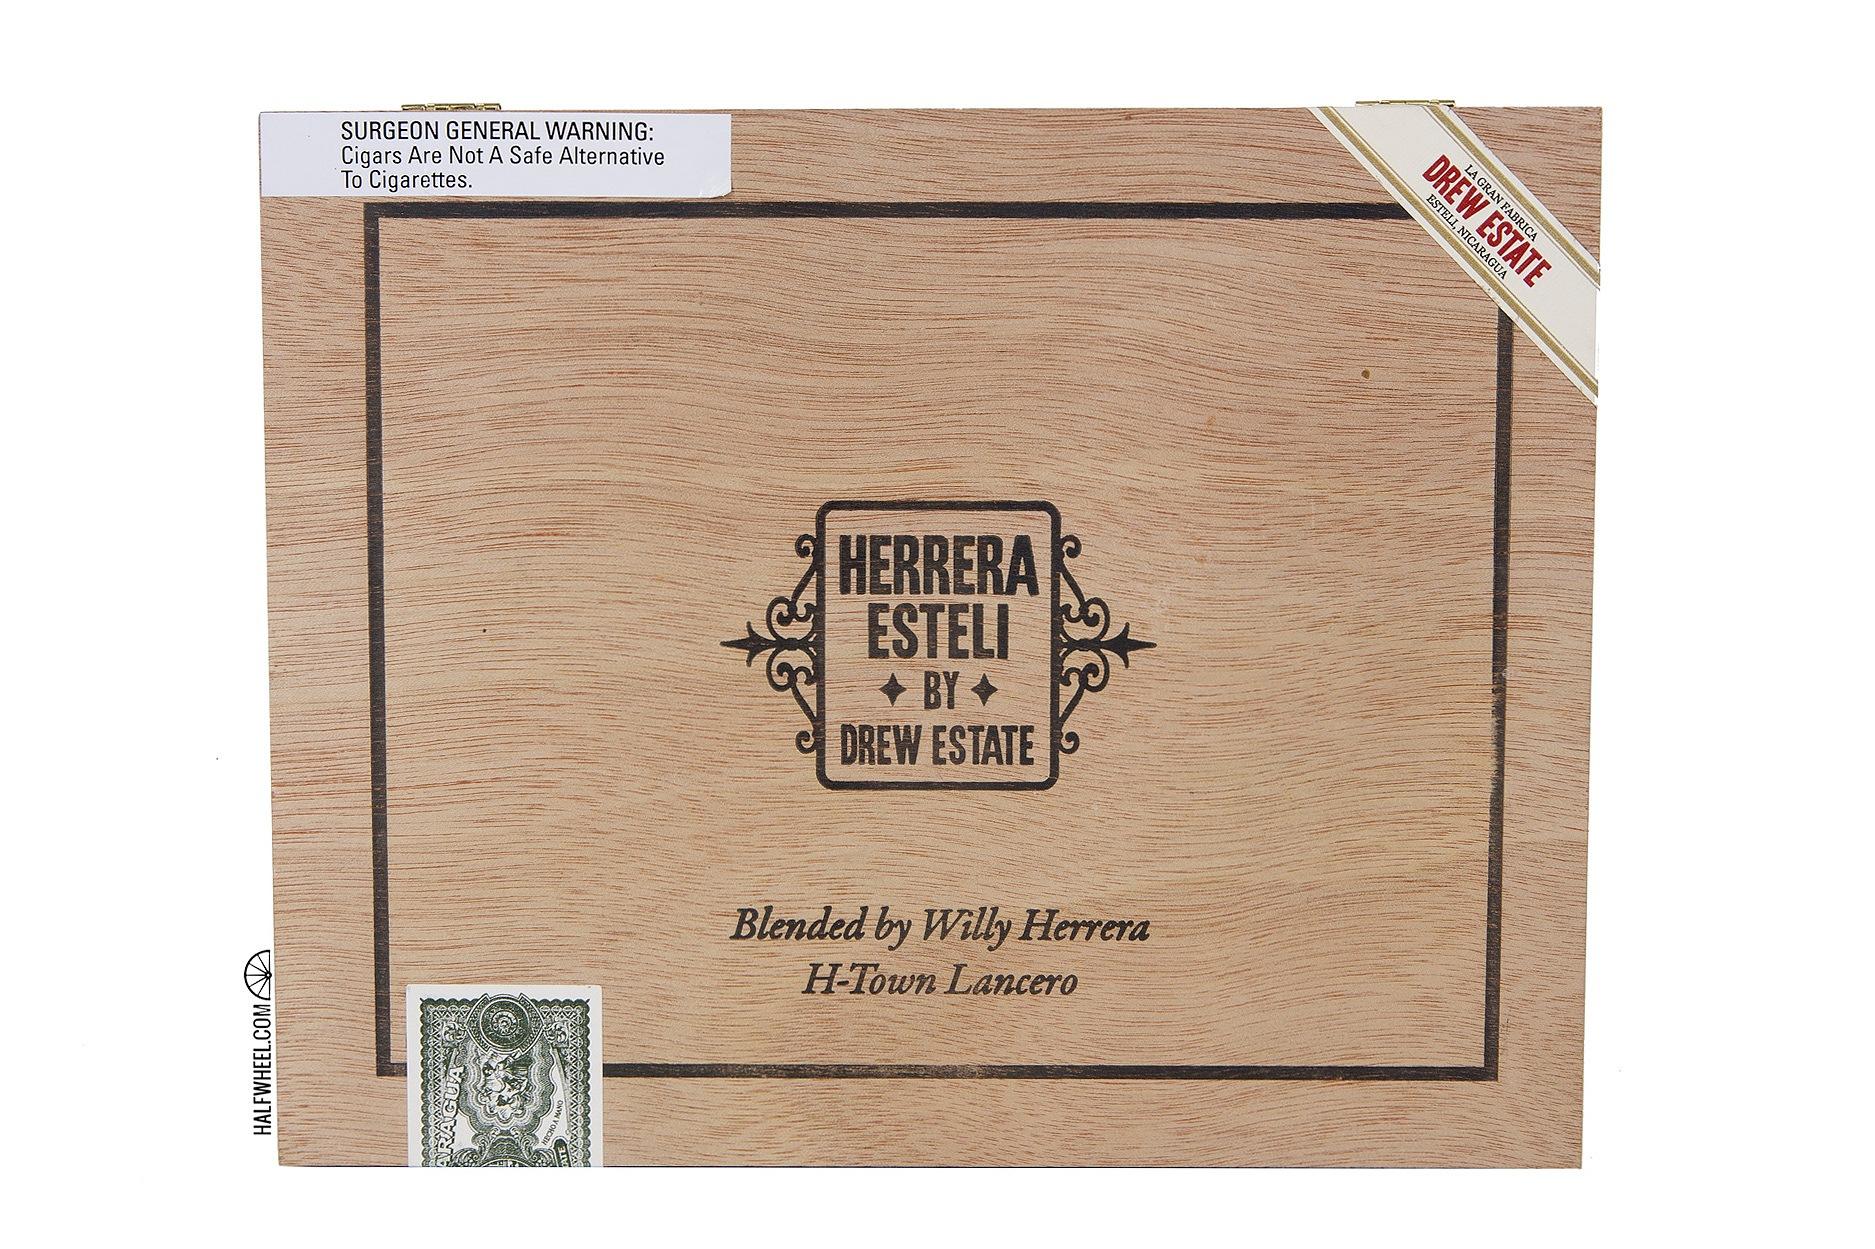 herrera-esteli-edicion-limitada-h-town-lancero-box-1